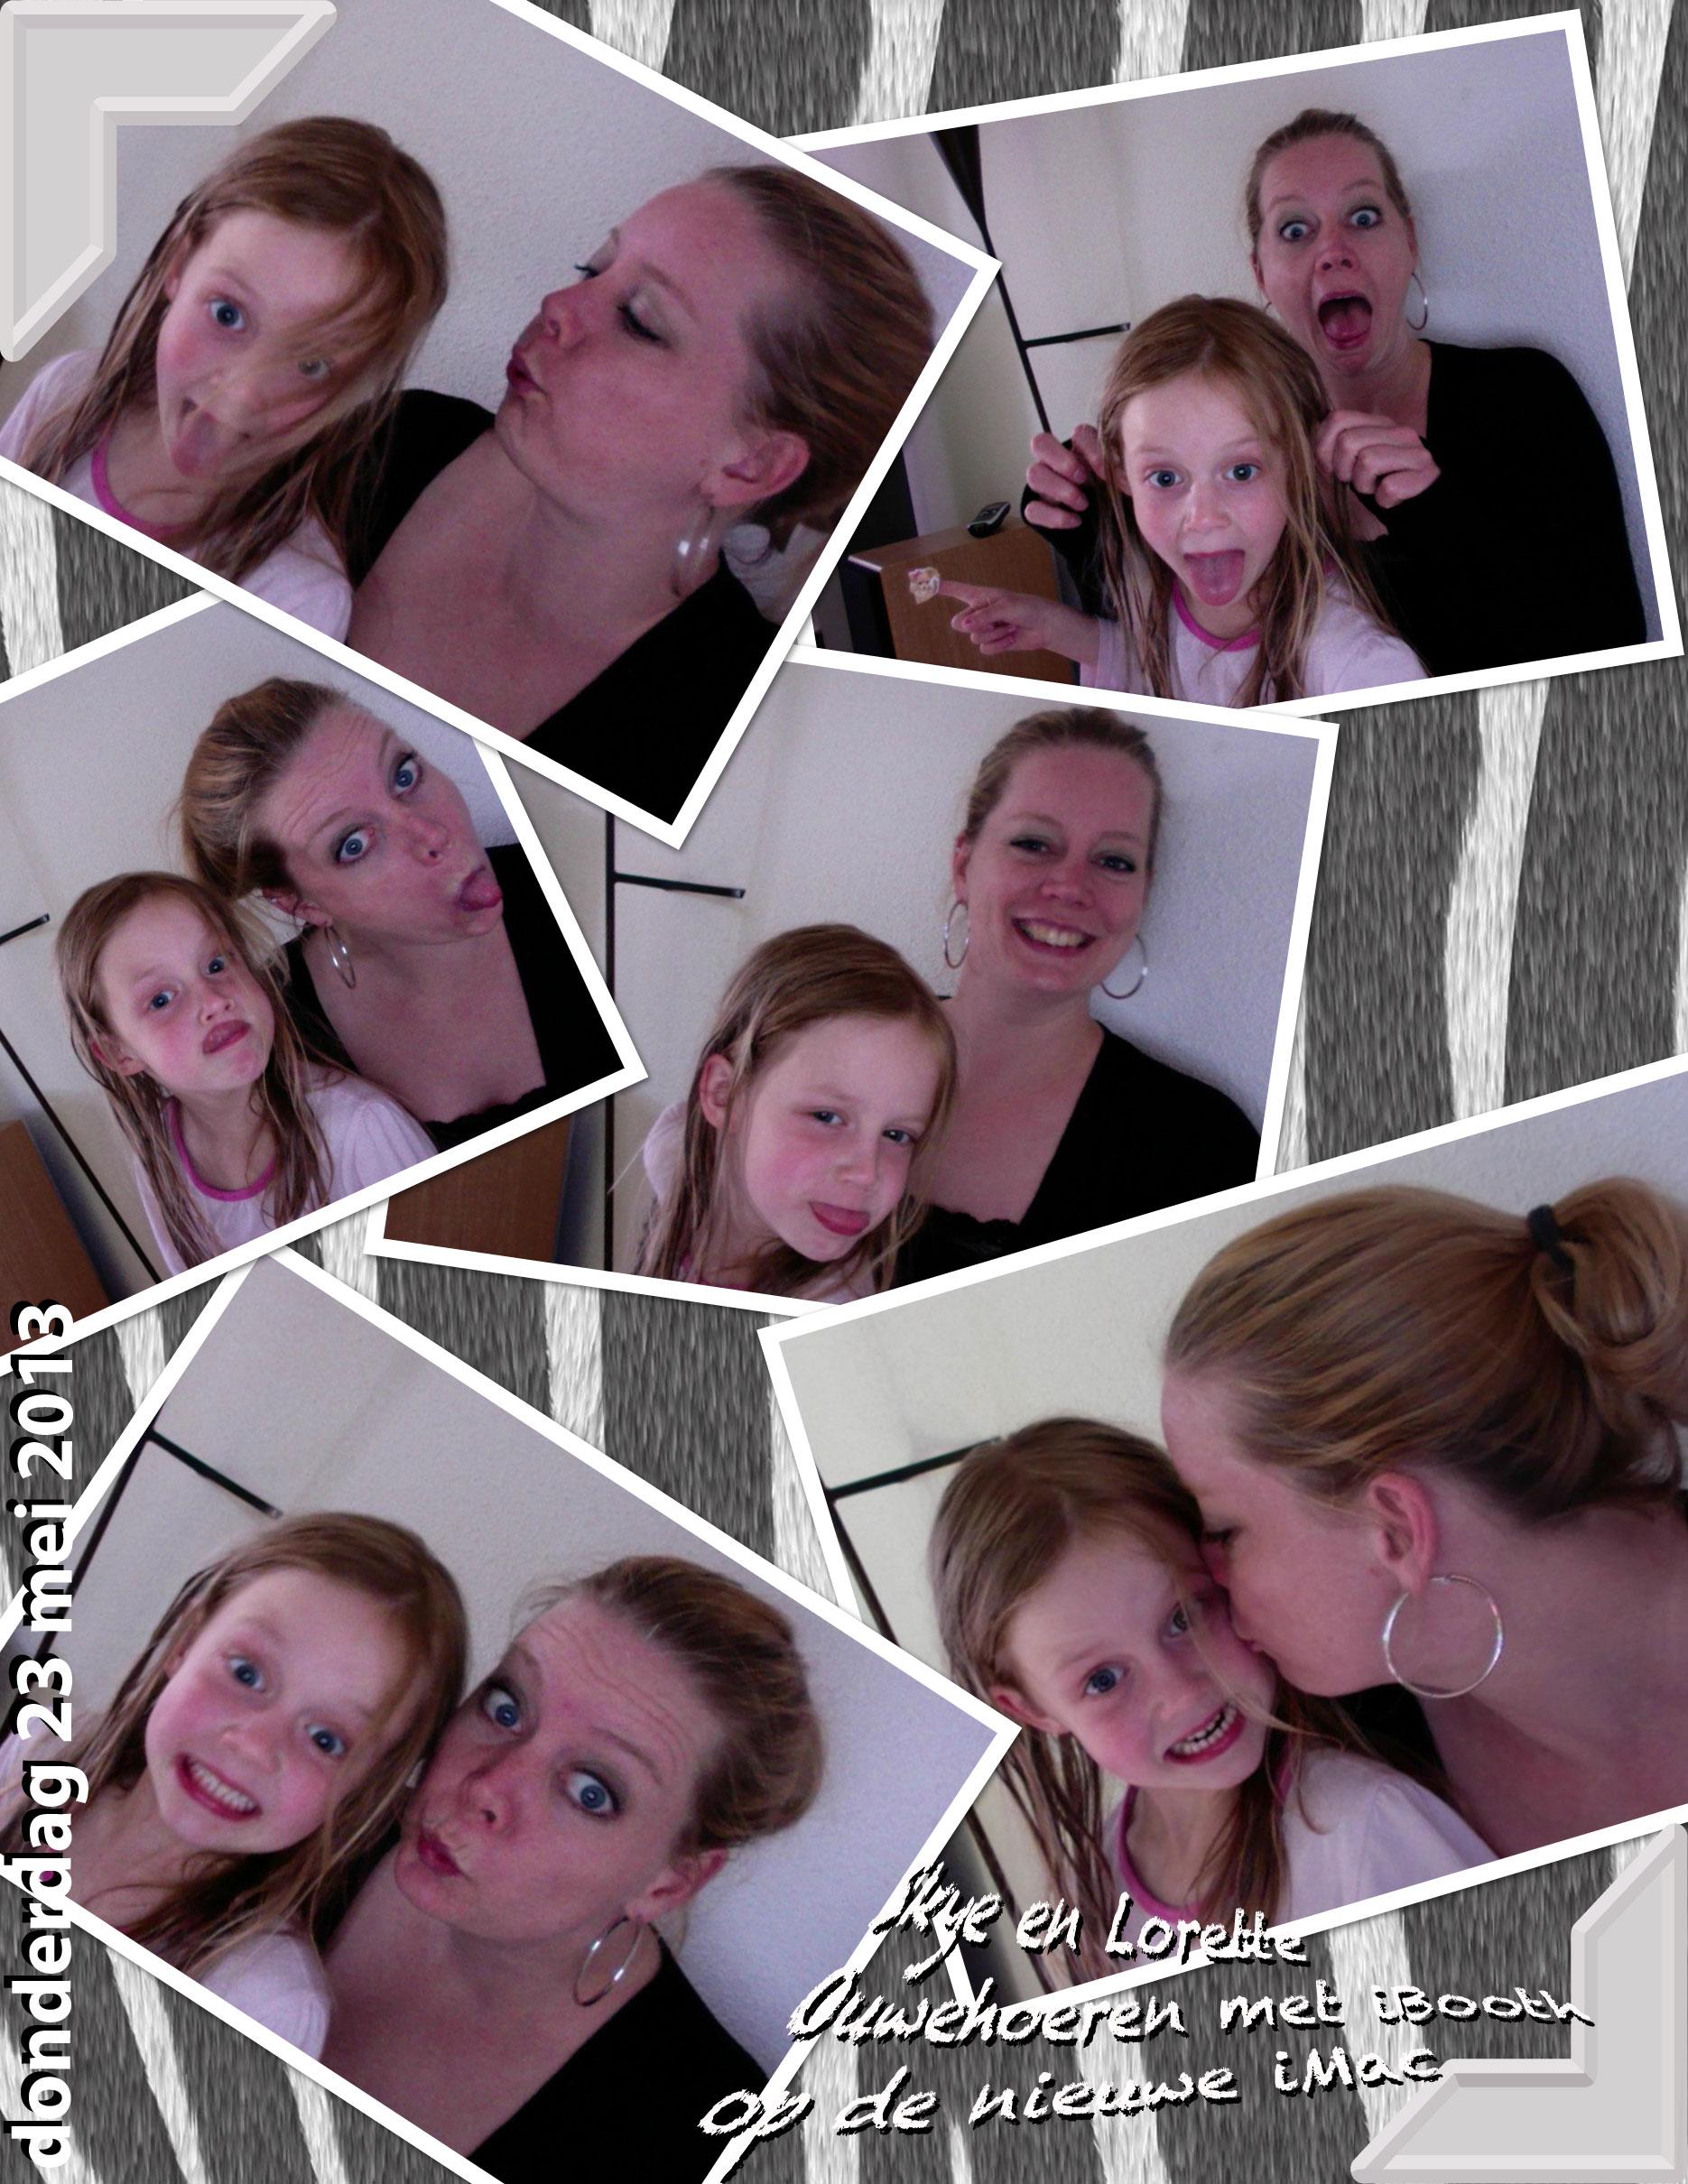 Skye en Lorette spelen met Photo Booth